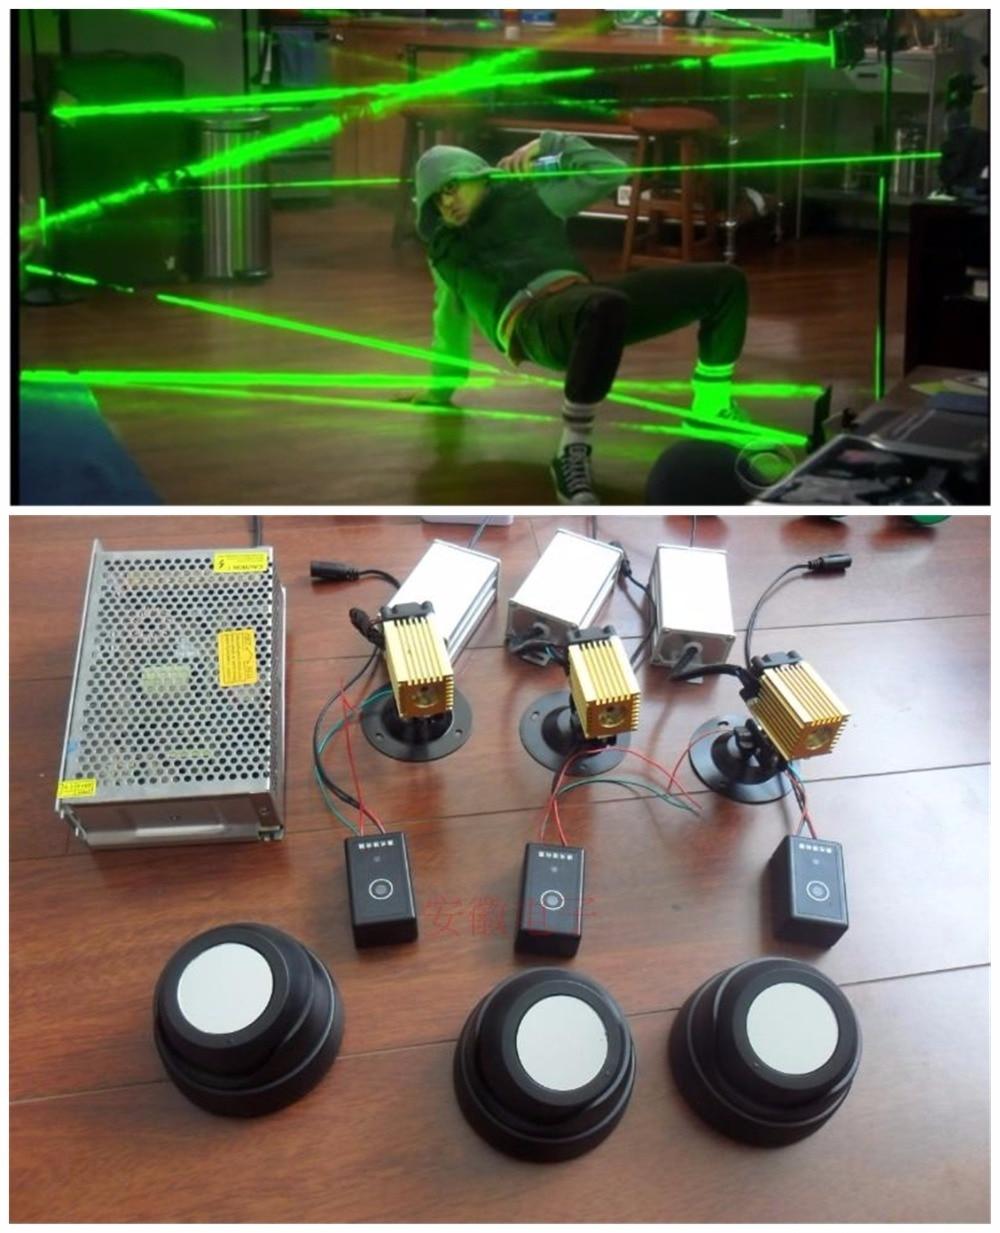 hotsale design magic penetralium escape props Real life room green laser array chamber of escape secret game kit